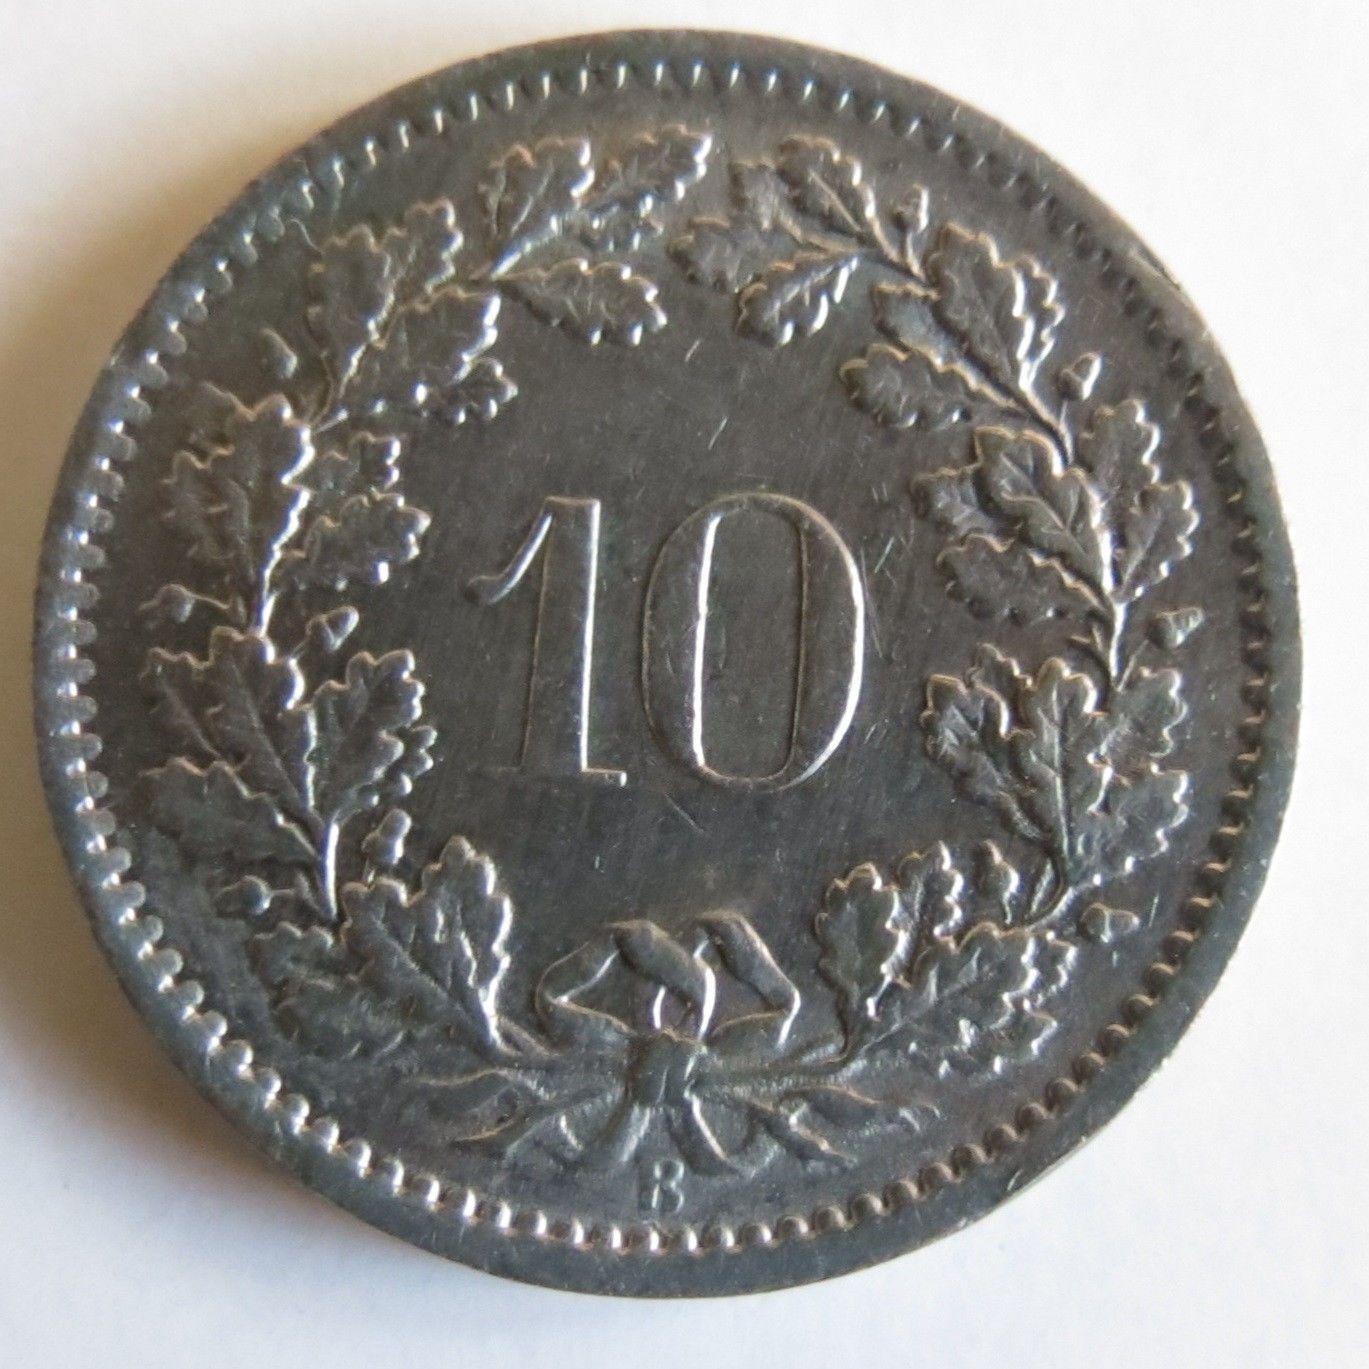 1967 Swiss 10 Rappen Coin http://www.ebay.com/sch/i.html?_trksid=p2054897.m570.l1313.TR0.TRC0.H0.X1967+&_nkw=1967+Switzerland+10+Rappen+Coin&_sacat=11116&_from=R40